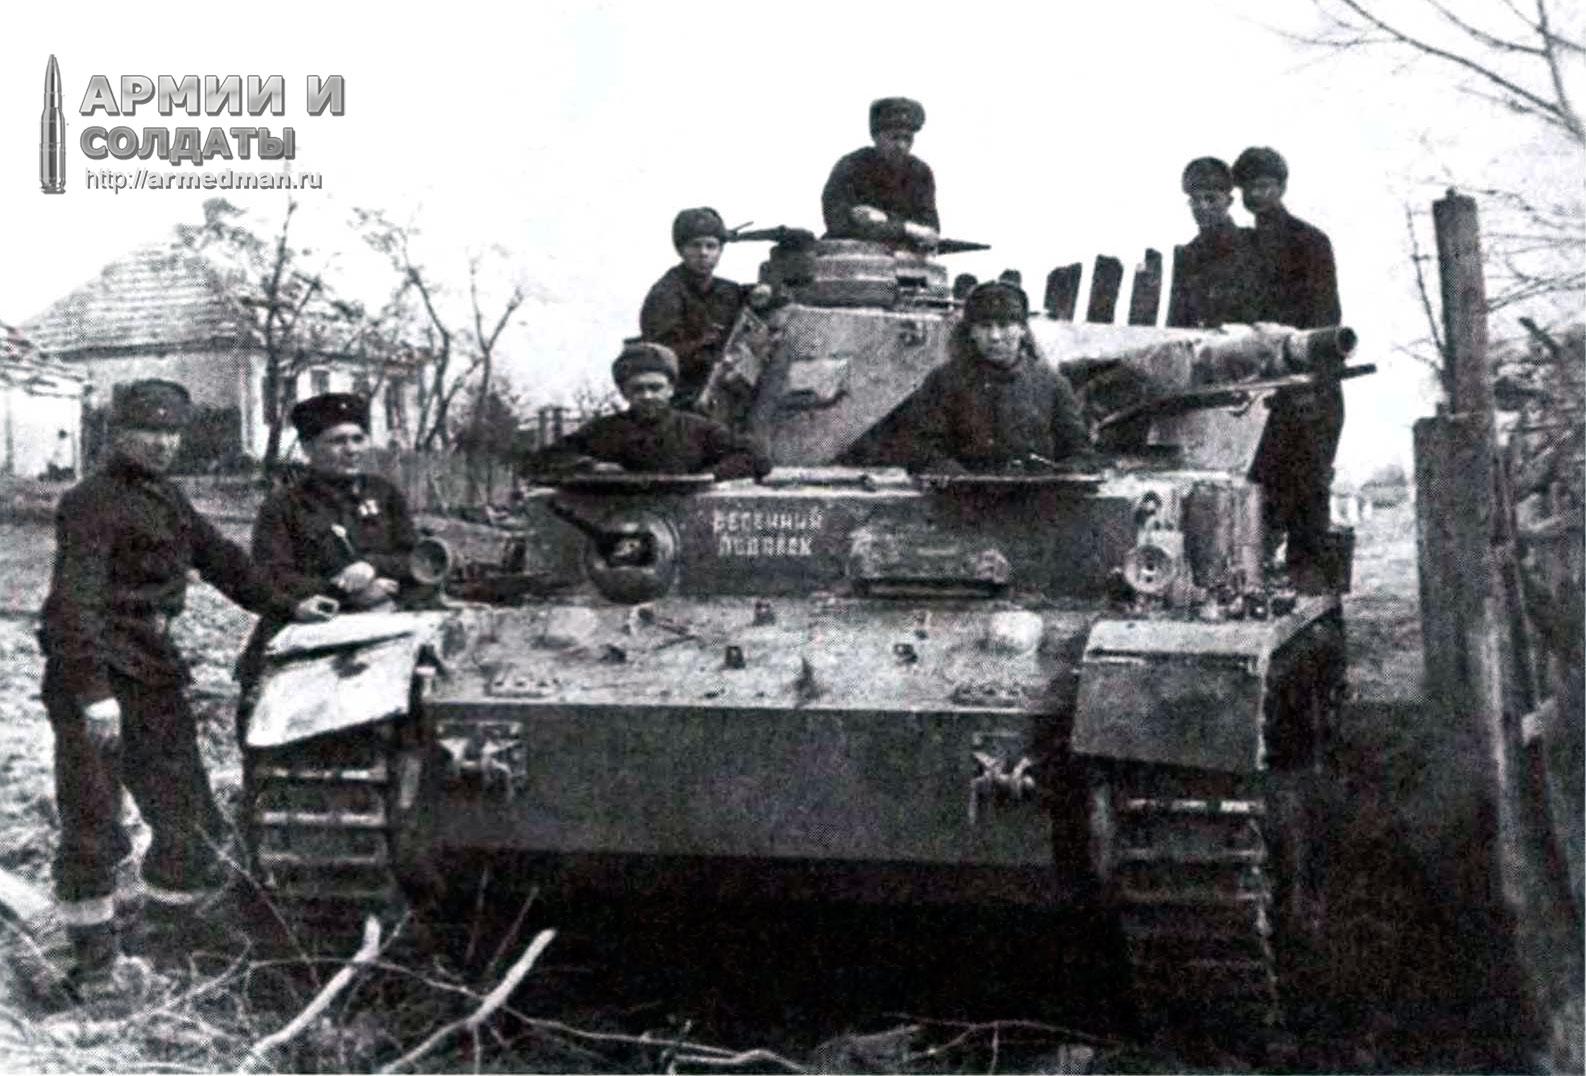 Pz-IV-(Весенний-подарок,-надпись-на-лобовой-броне),-северо-кавказский-фронт,-1943